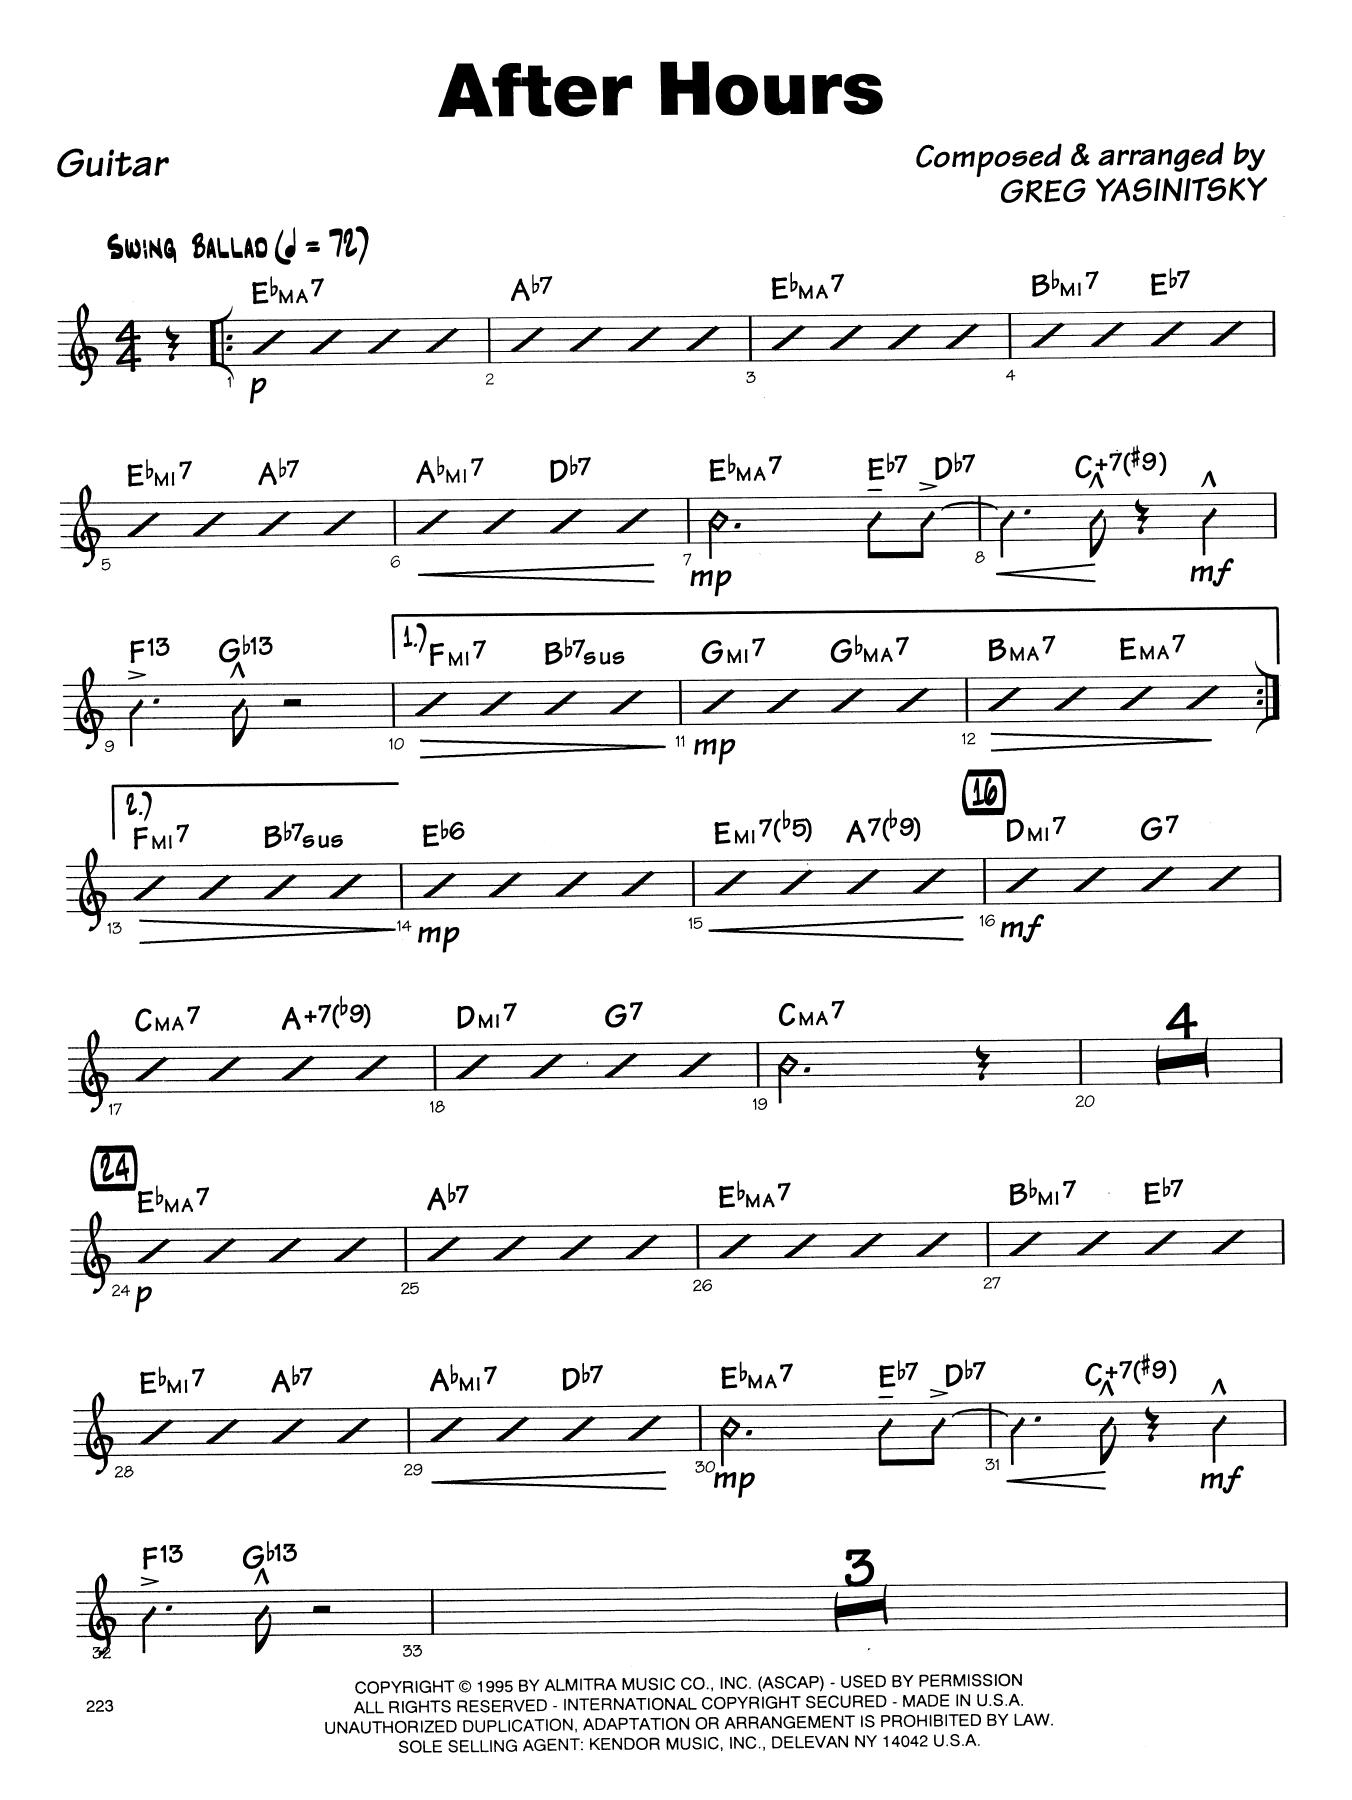 Gregory Yasinitsky After Hours - Guitar sheet music notes printable PDF score